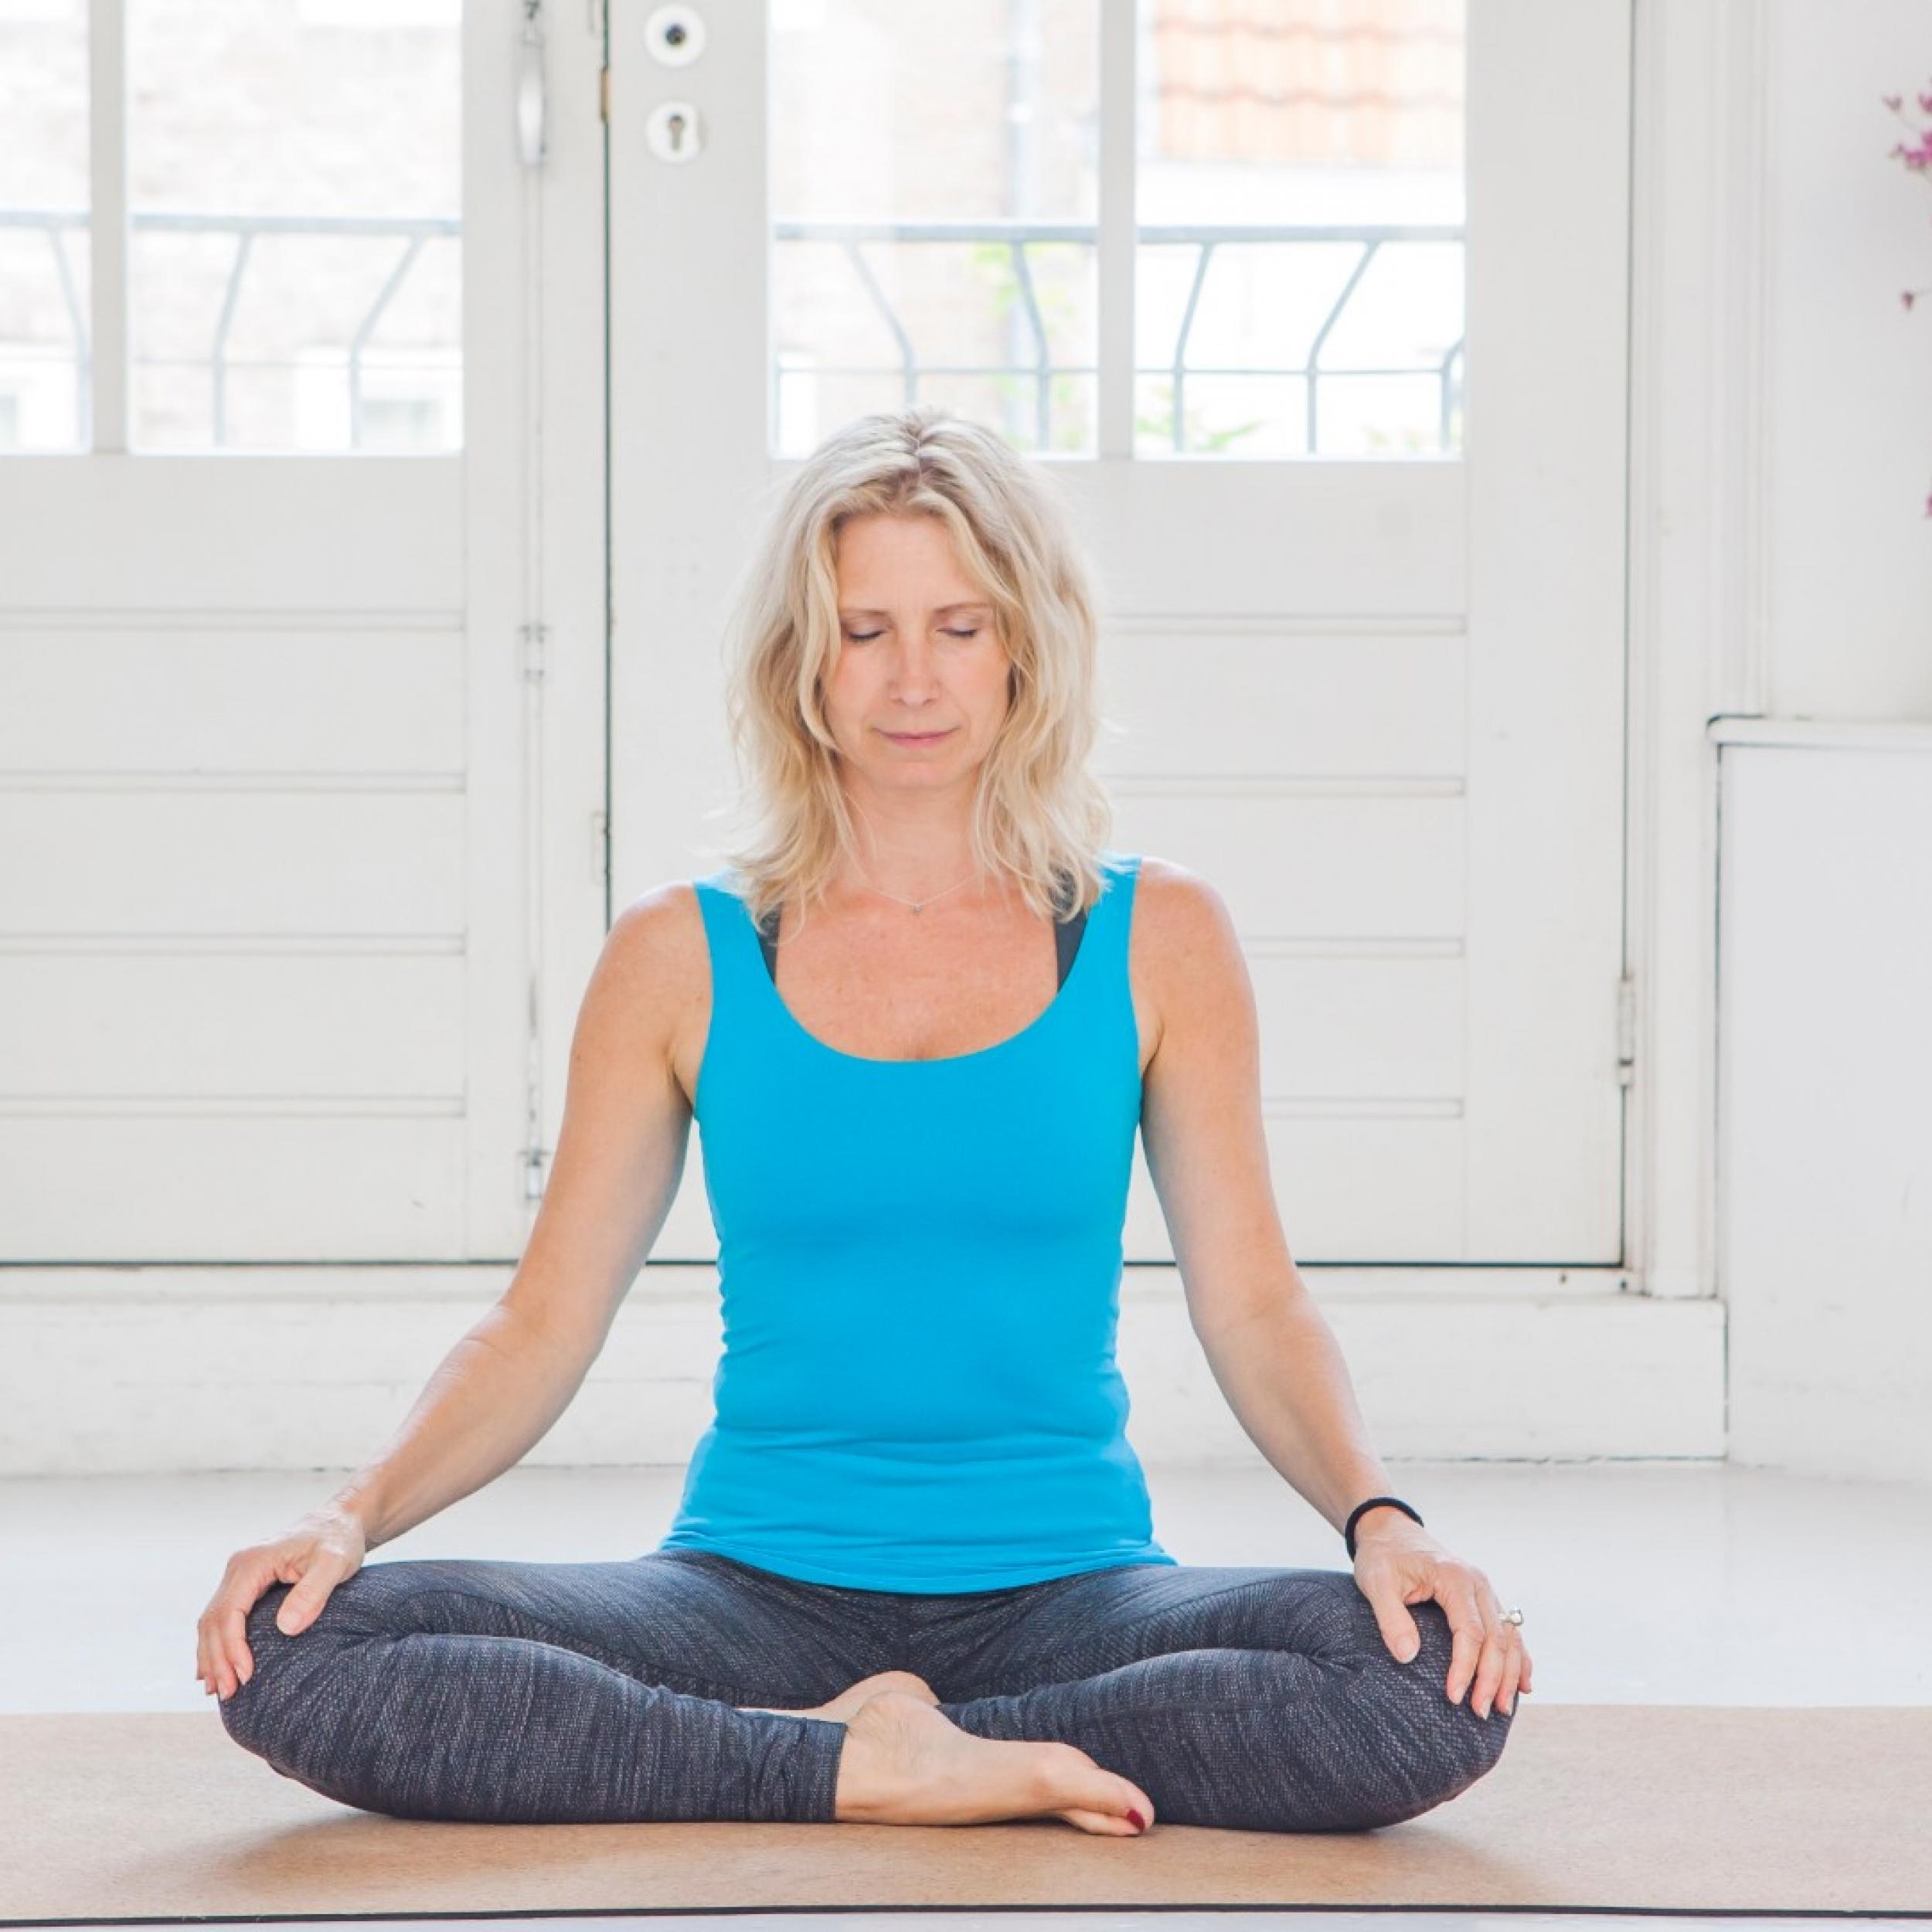 5 minute breathing exercises